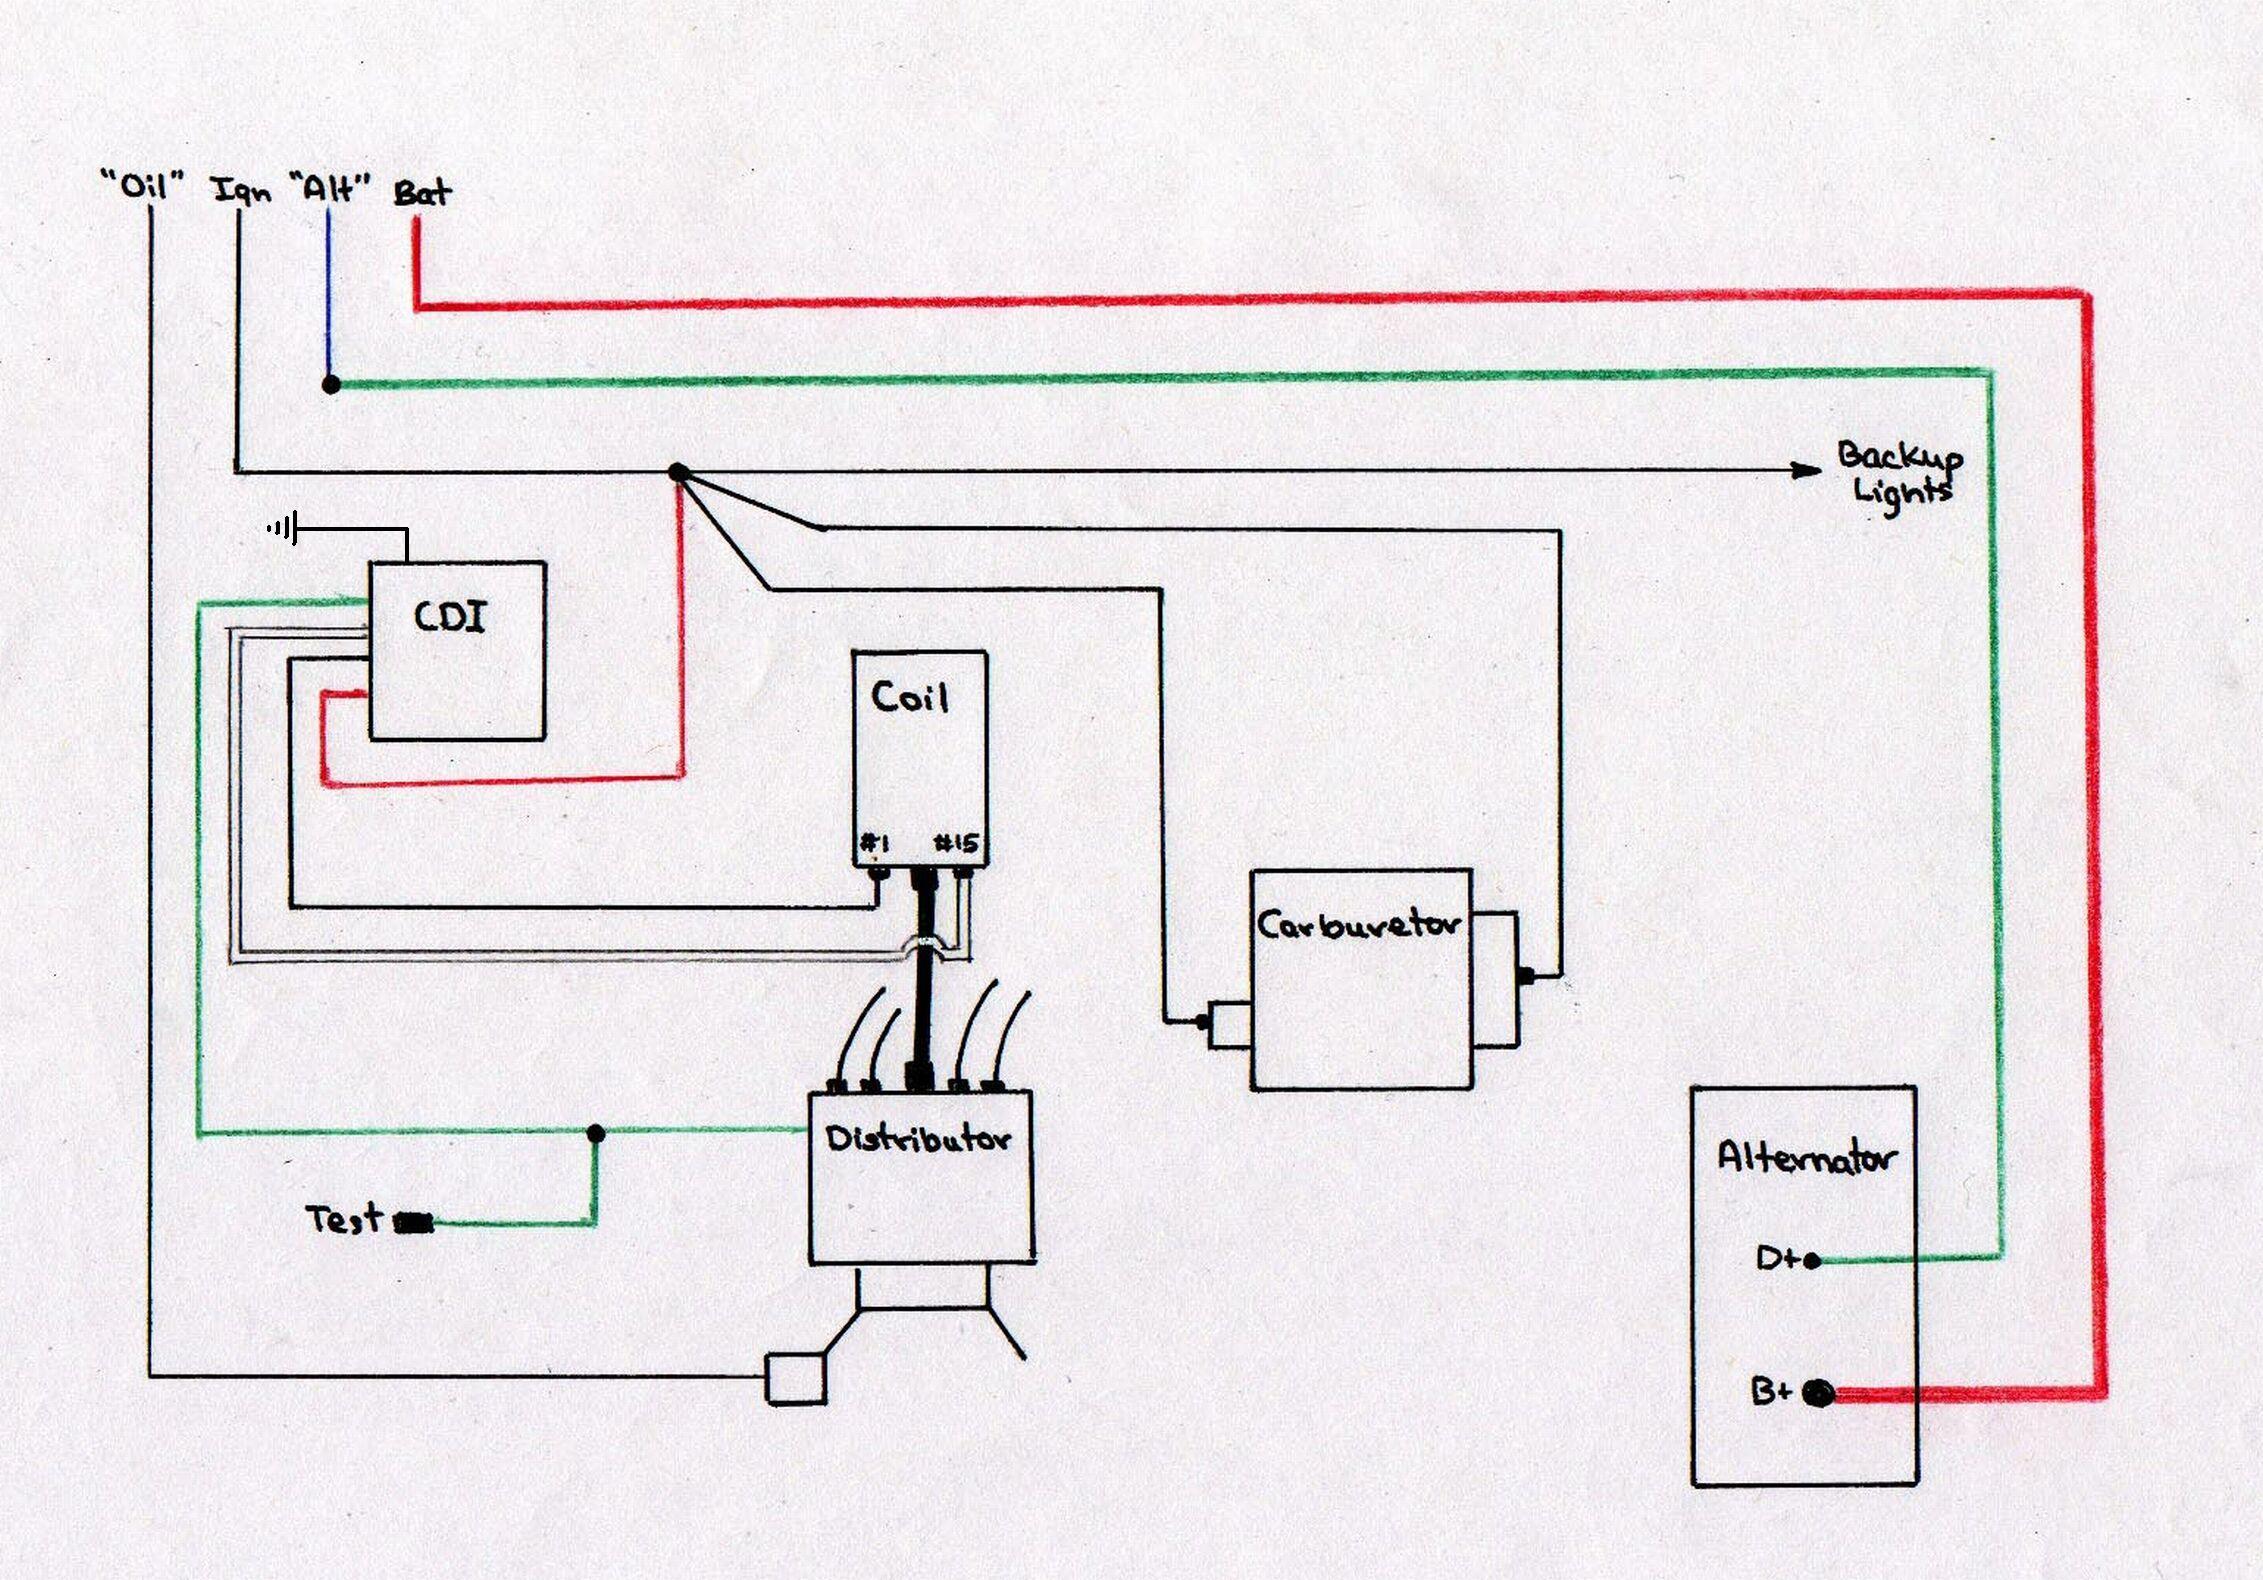 Linhai Atv Wiring Diagram Diagrams For Dummies Hisun Utv 500 260 Library Rh 46 Codingcommunity De